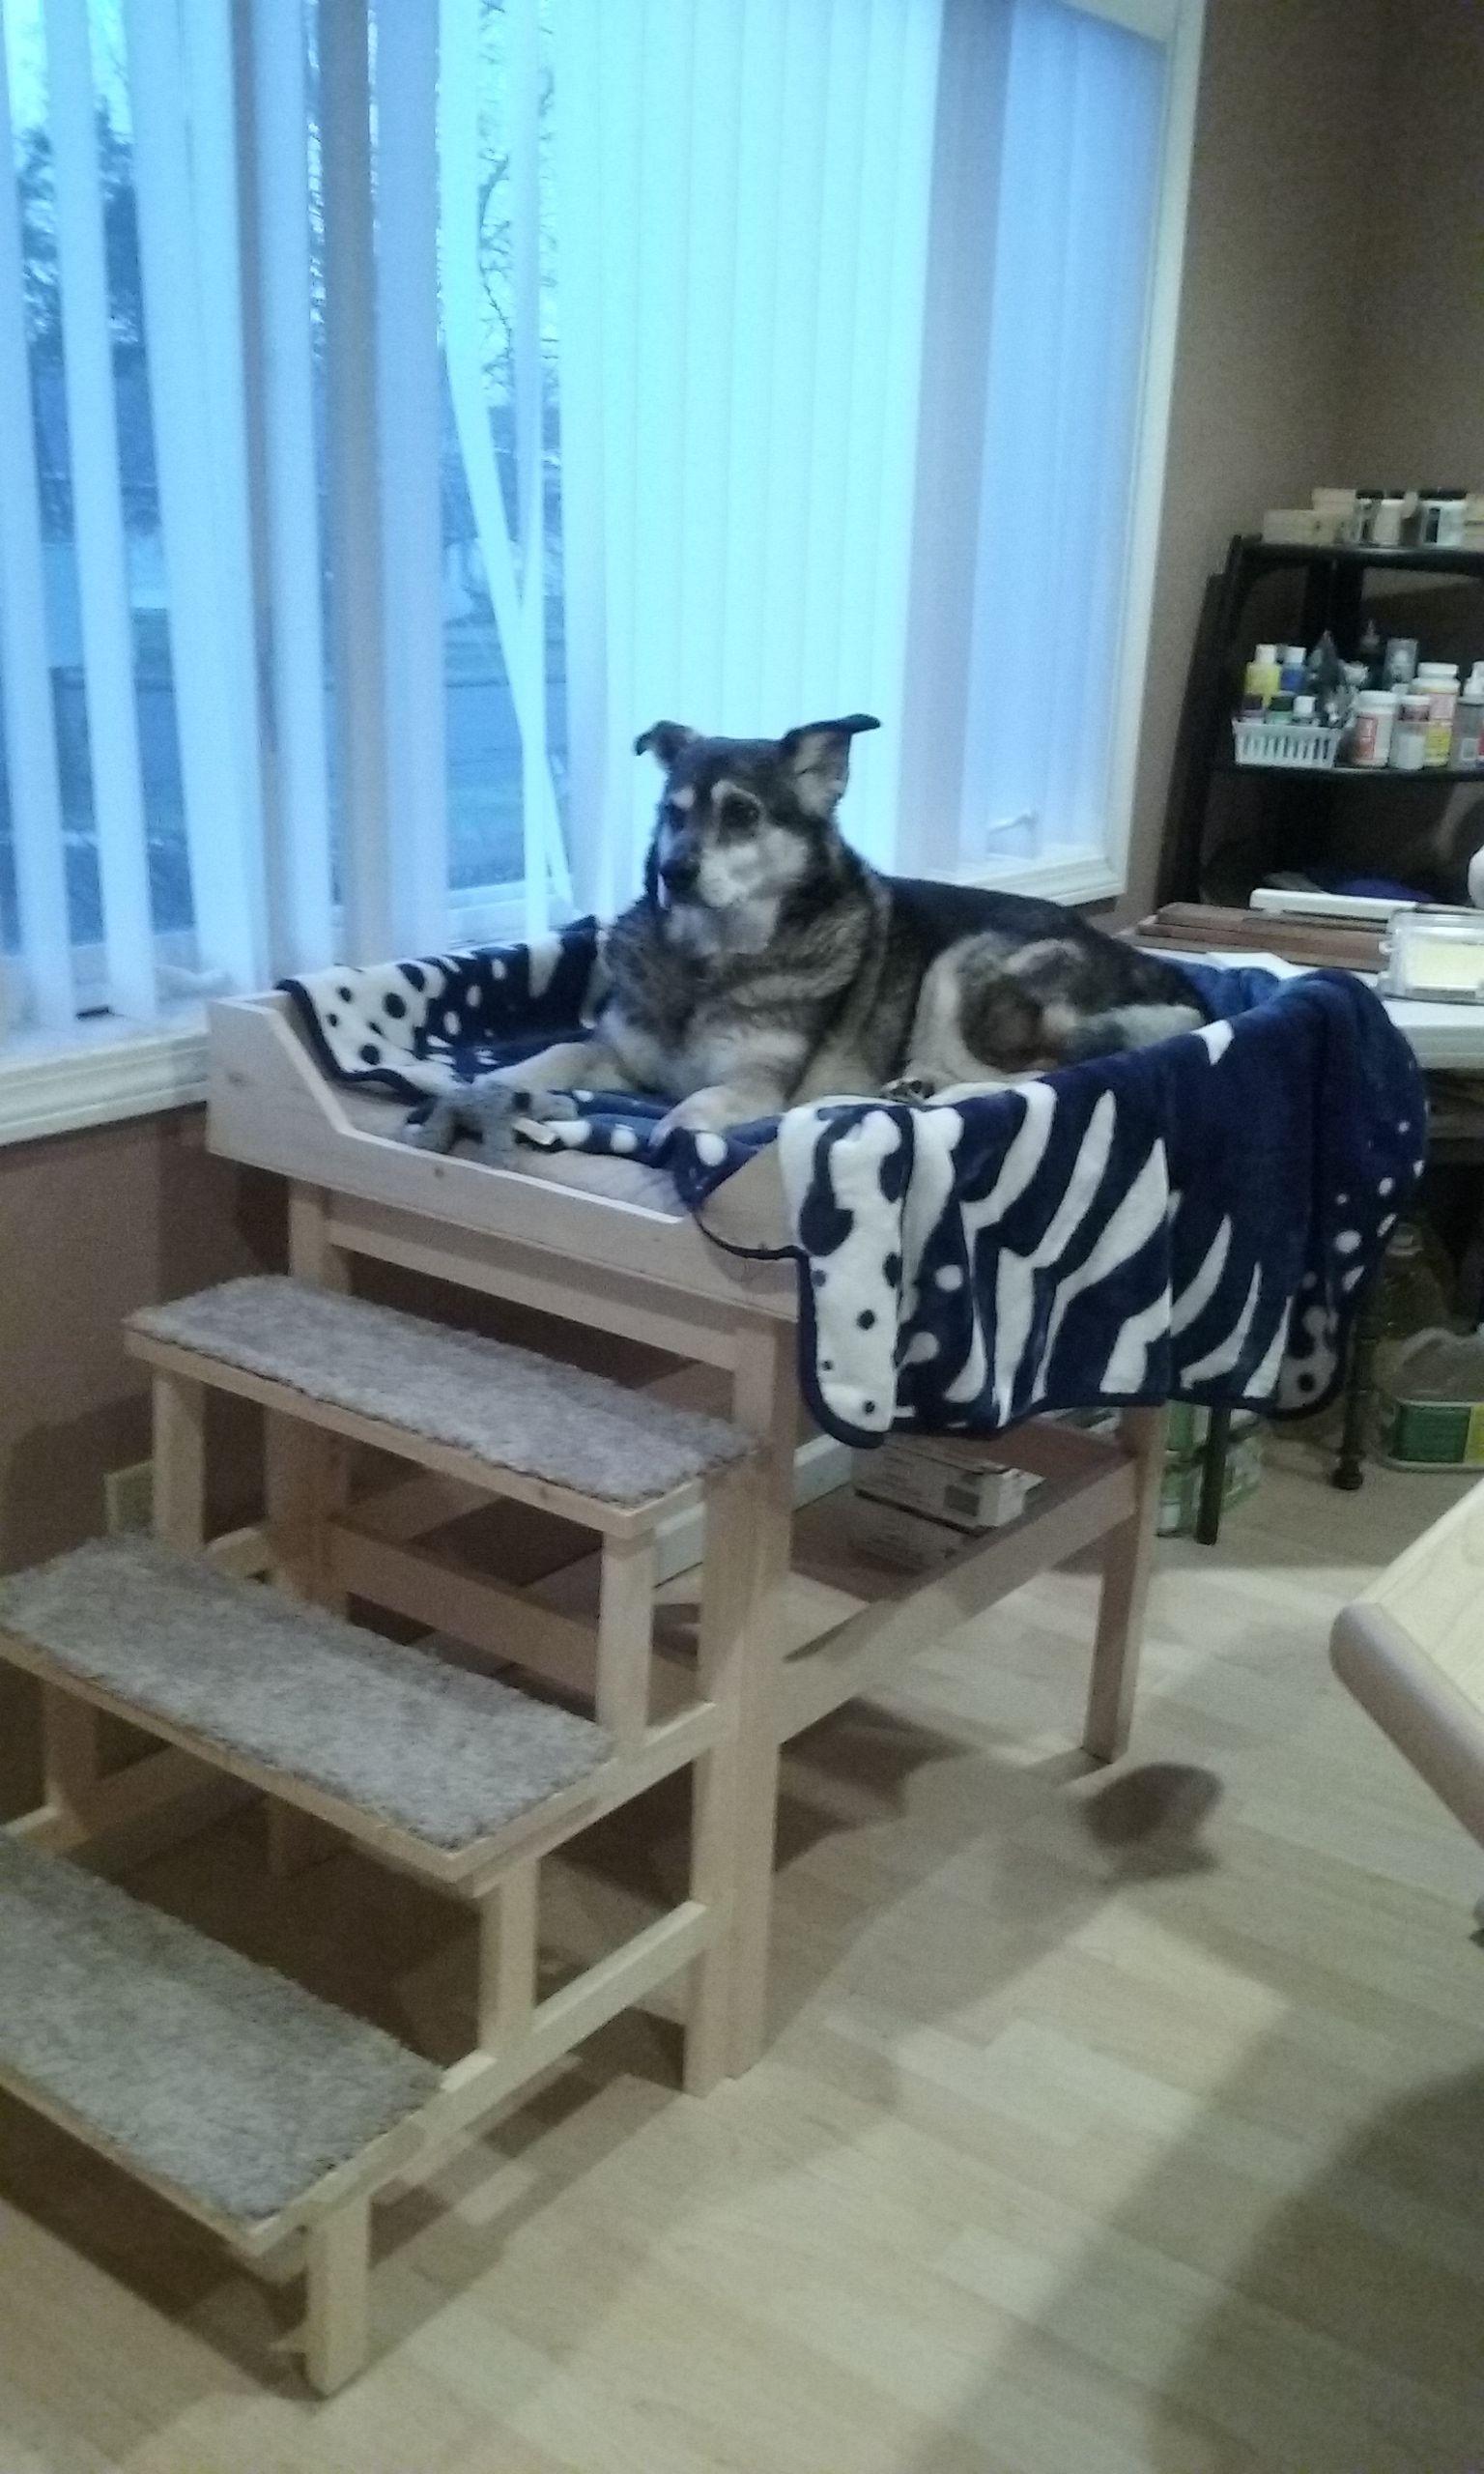 33 Hx56 Lx26 W Dog Perch Dog Window Seat Sick Dog Crib Dog